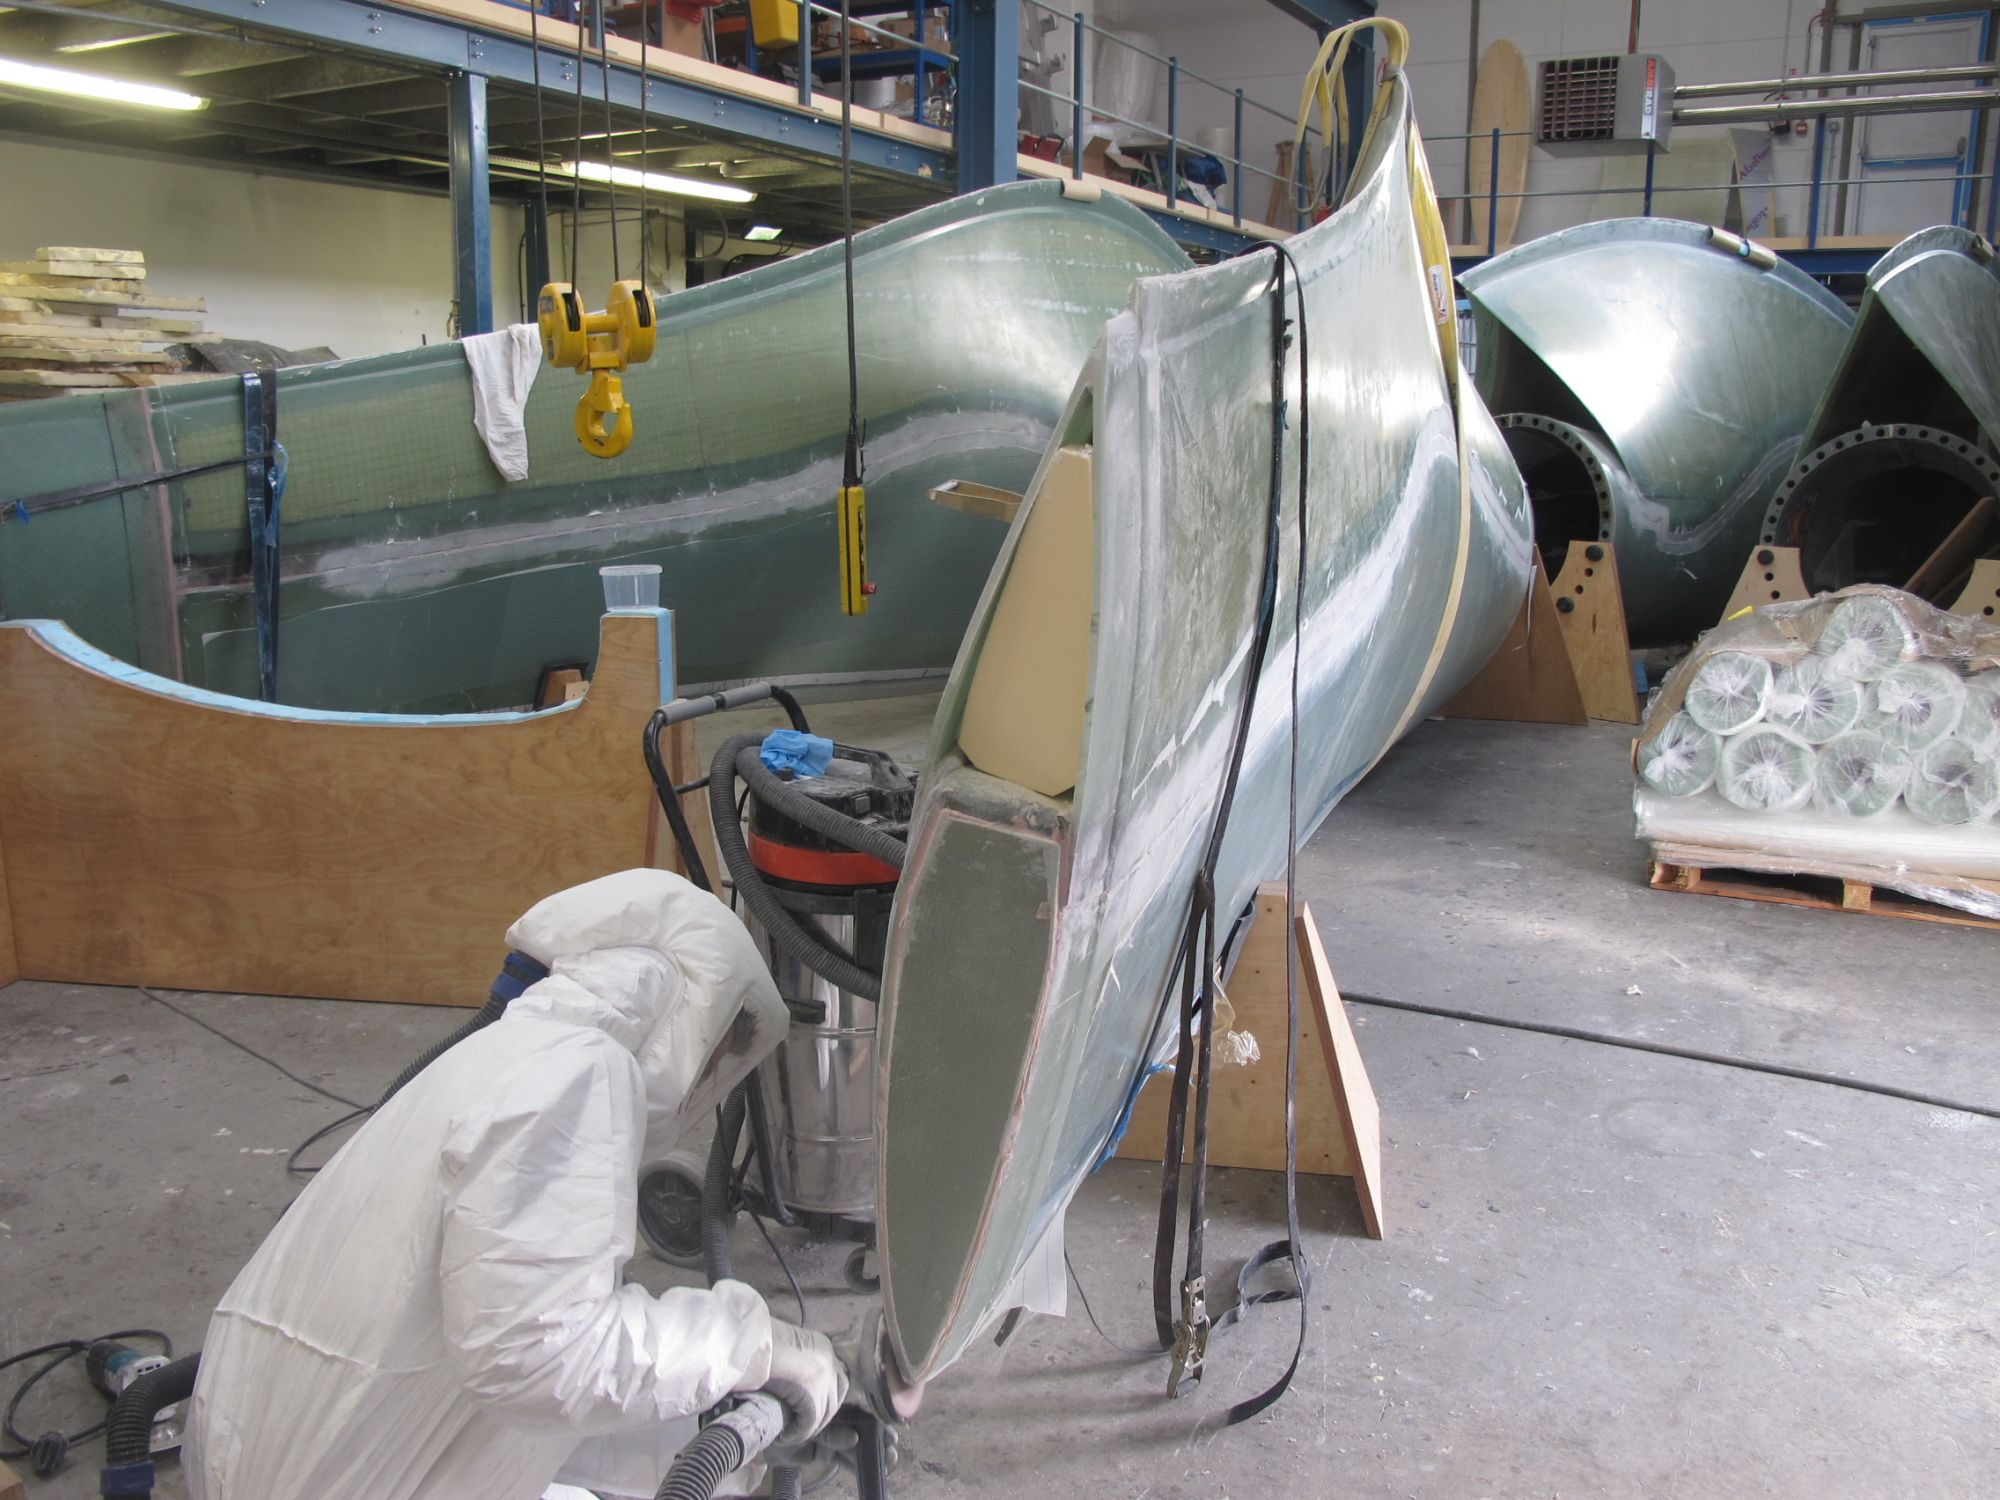 Tidal turbine blade under construction